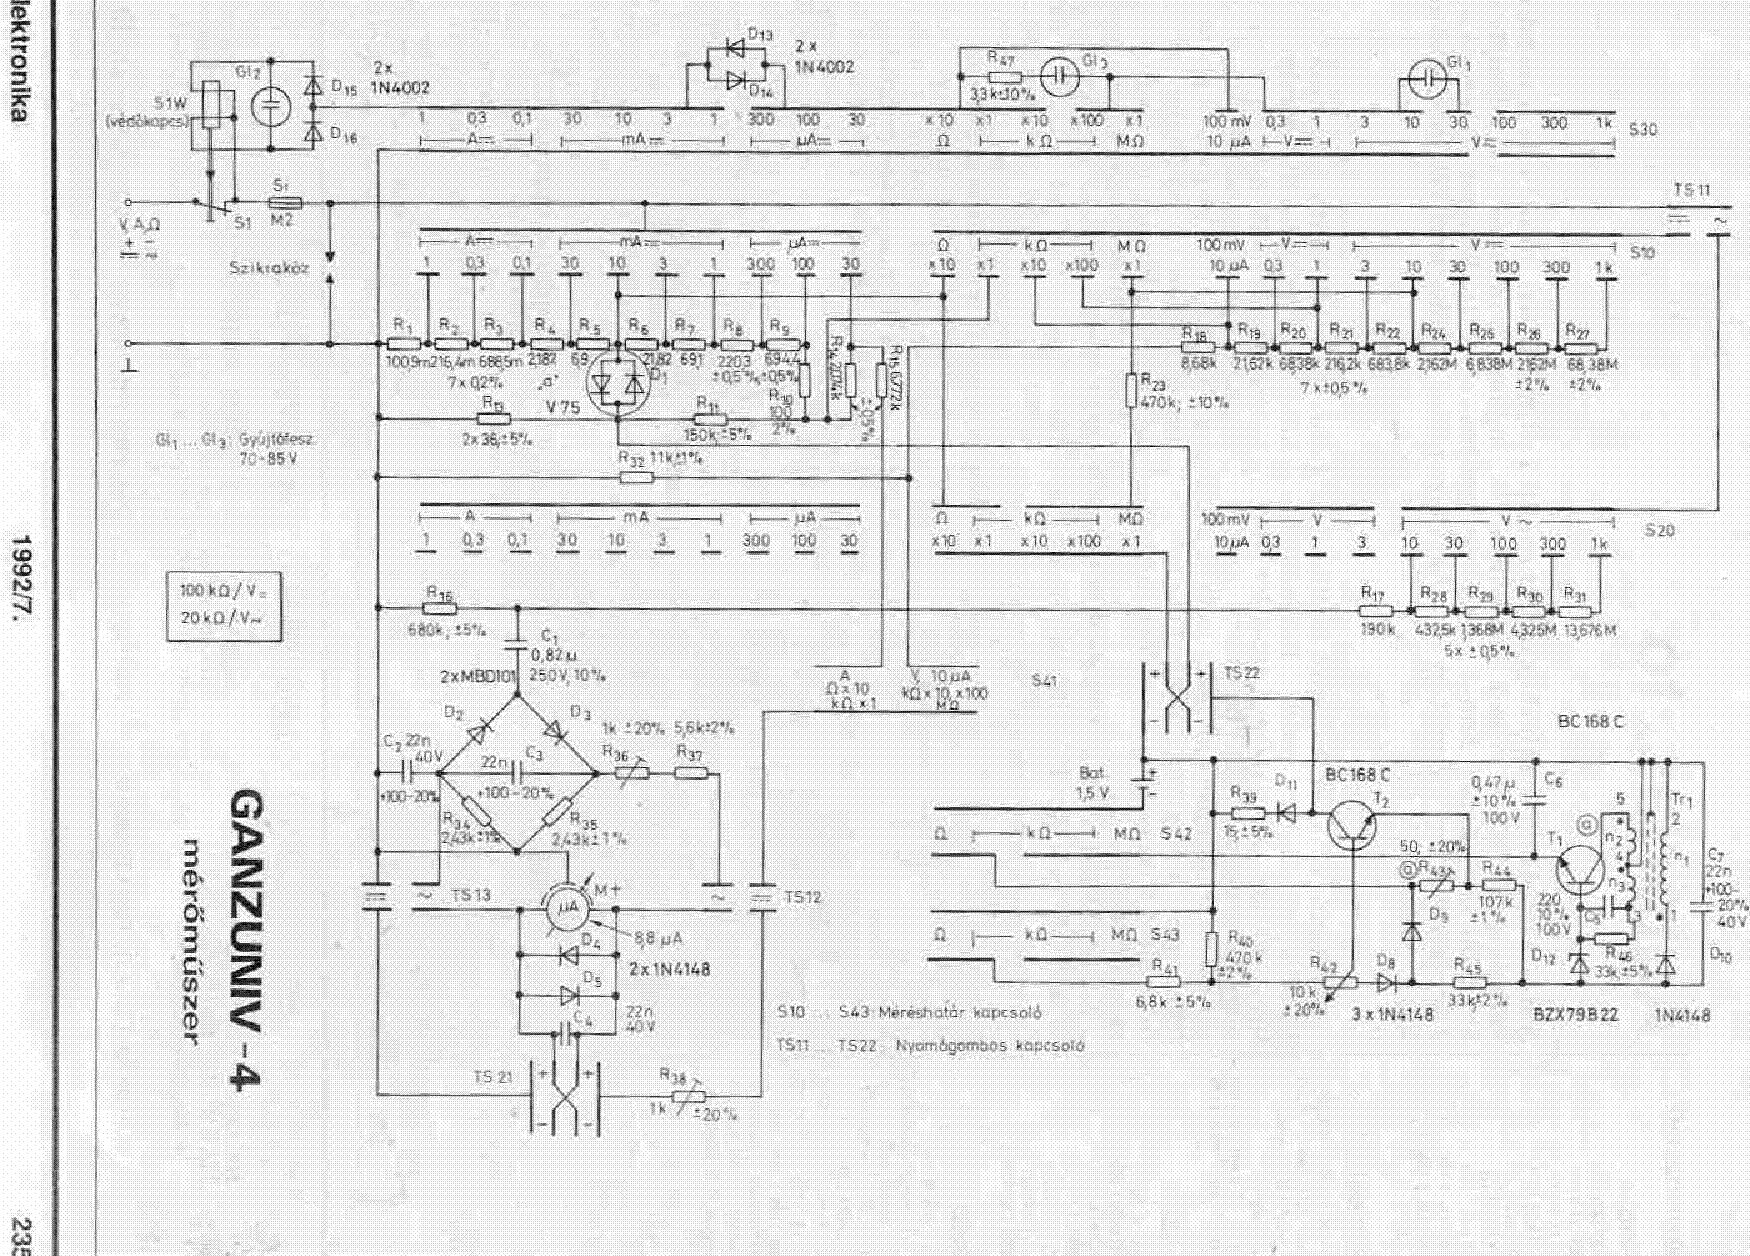 ganzuniv 4 analog multimeter service manual download schematics rh elektrotanya com analog multimeter m1015b manual gmt-312 analog multimeter manual